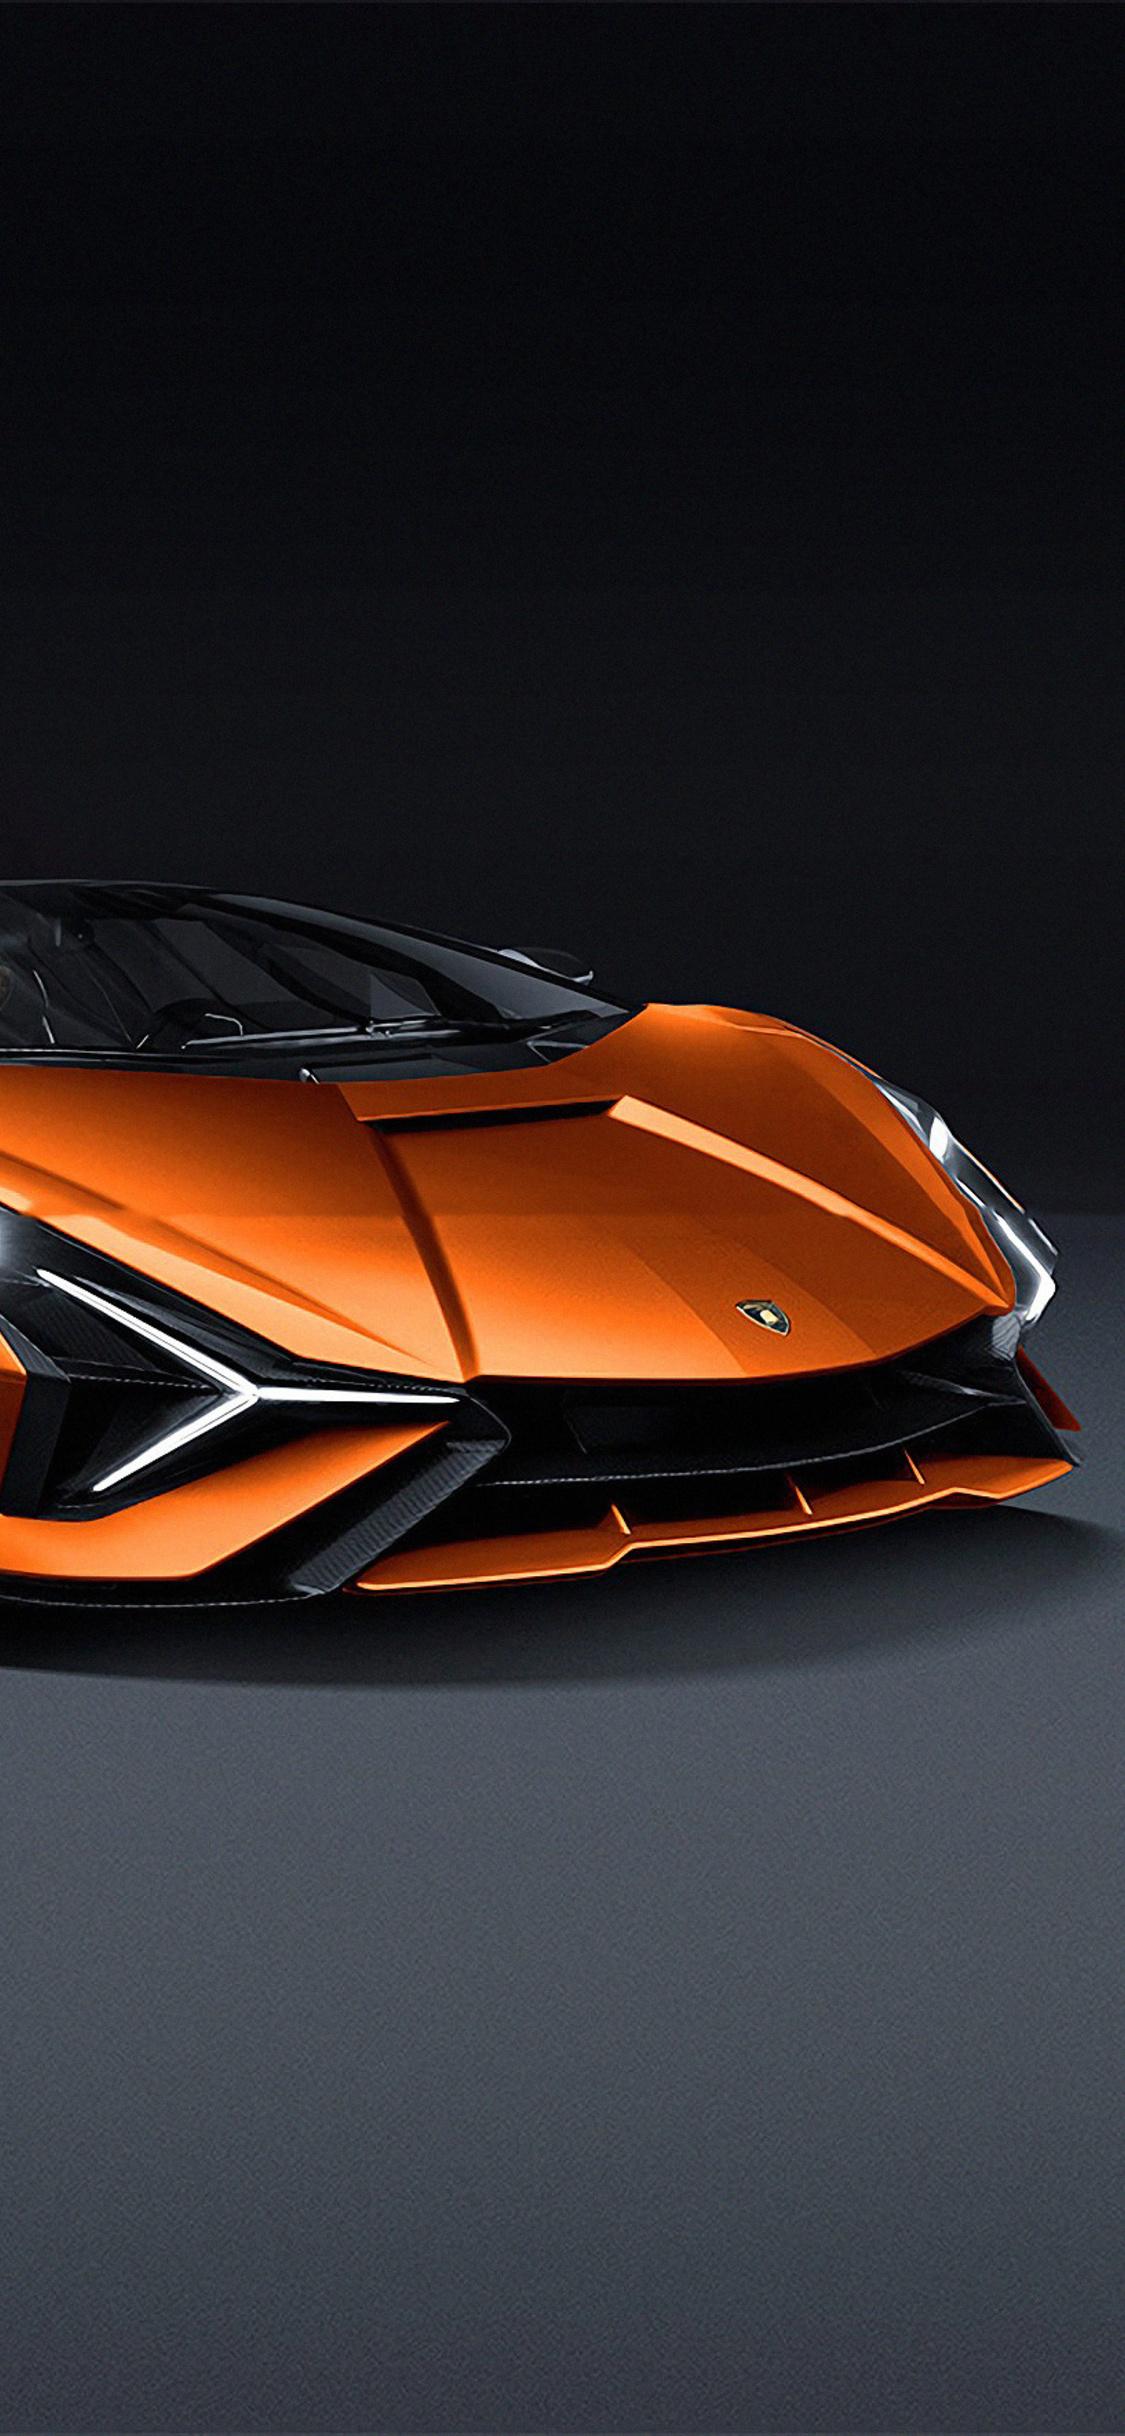 1125x2436 Lamborghini Sian 2019 Front View 4k Iphone Xs